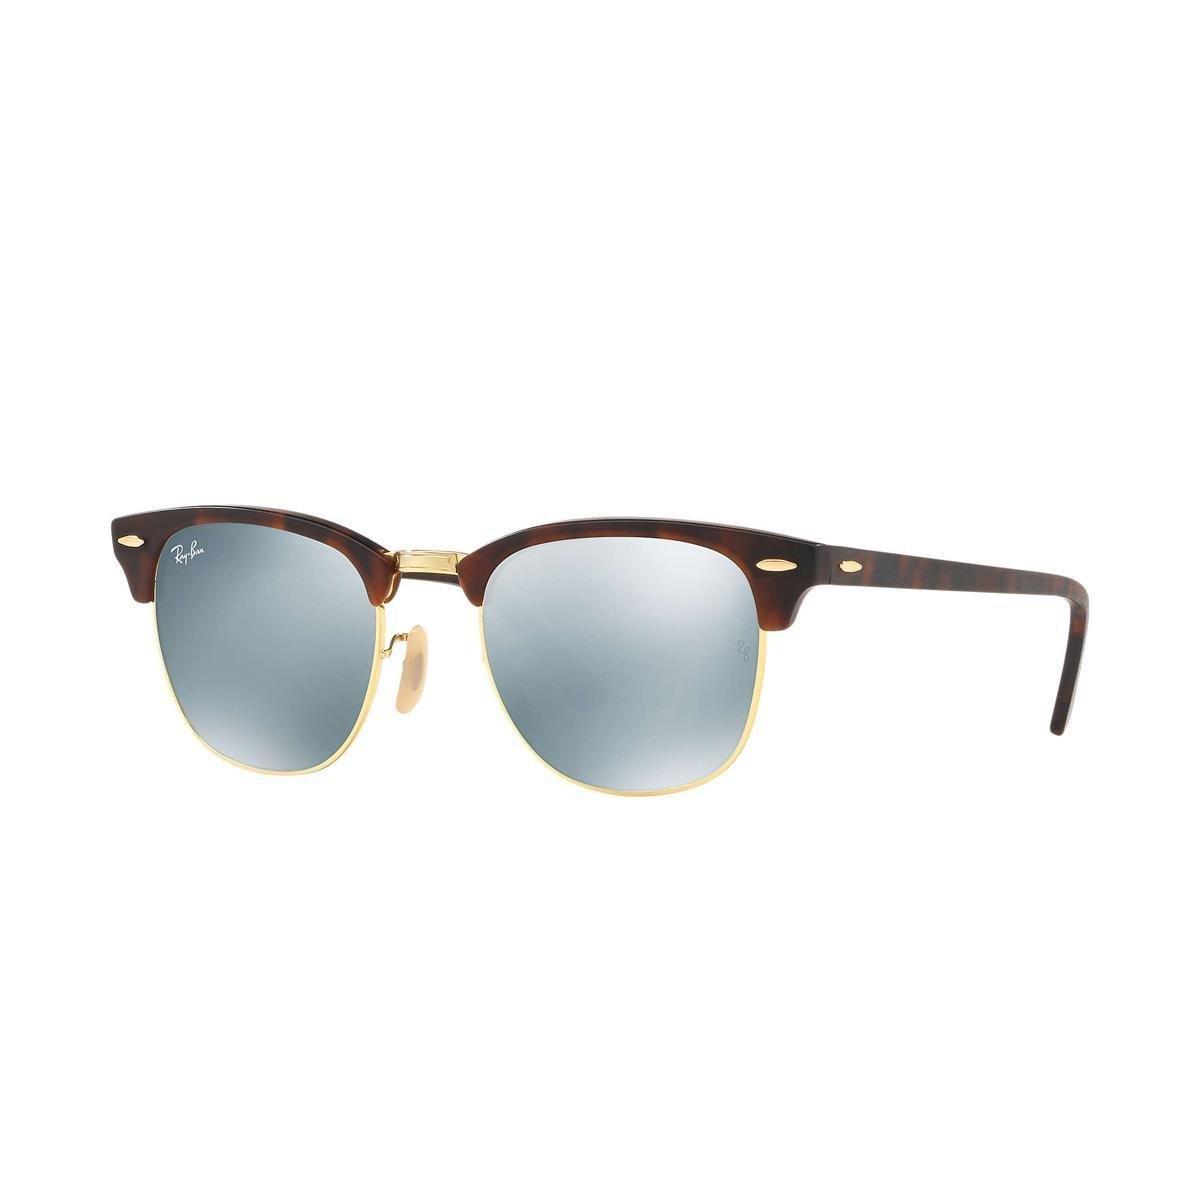 Óculos de Sol Ray-Ban Clubmaster Feminino - Marrom - Compre Agora ... ae7ce92bdc